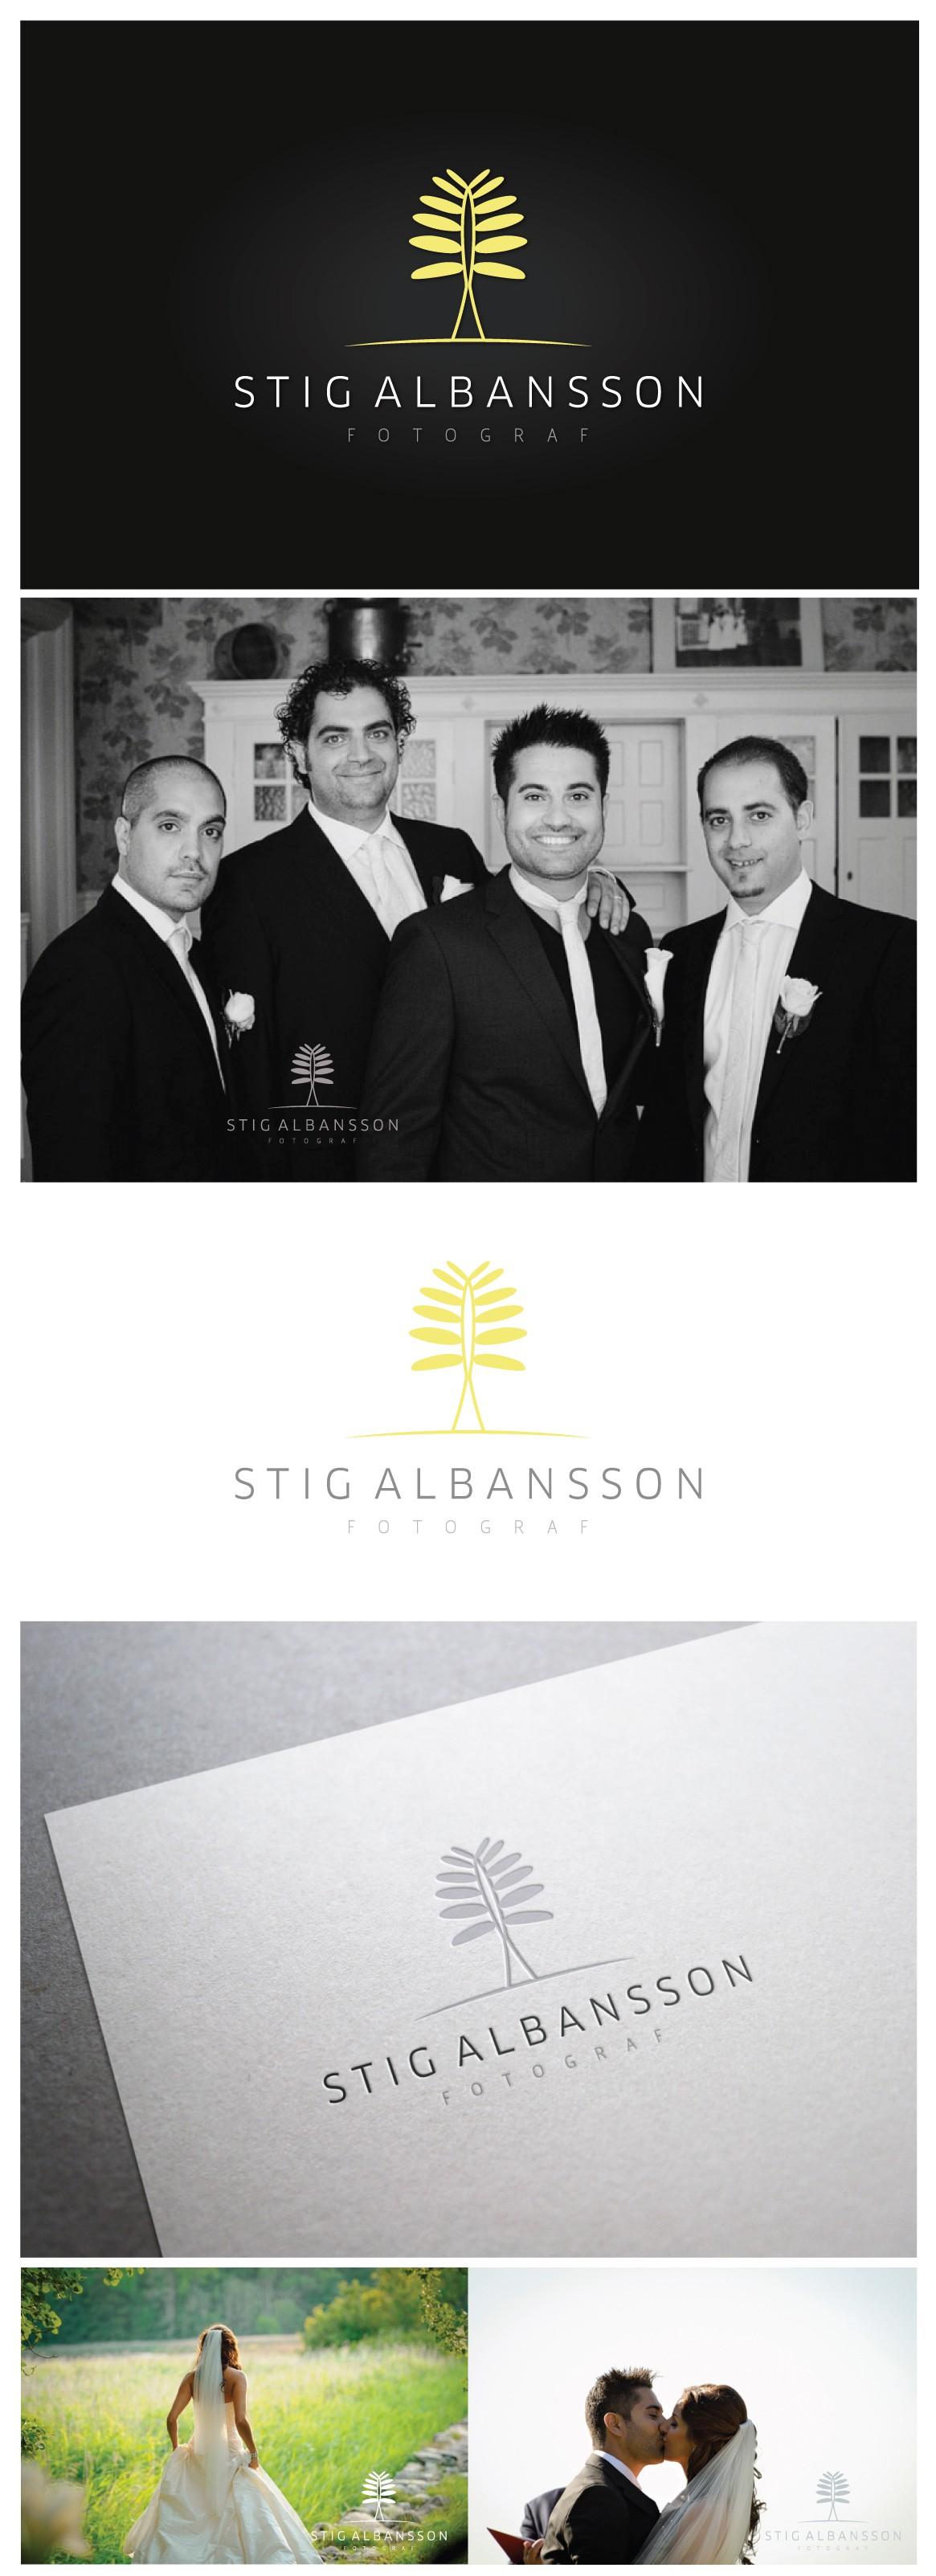 Create the next logo for Stig Albansson (photographer - fotograf)